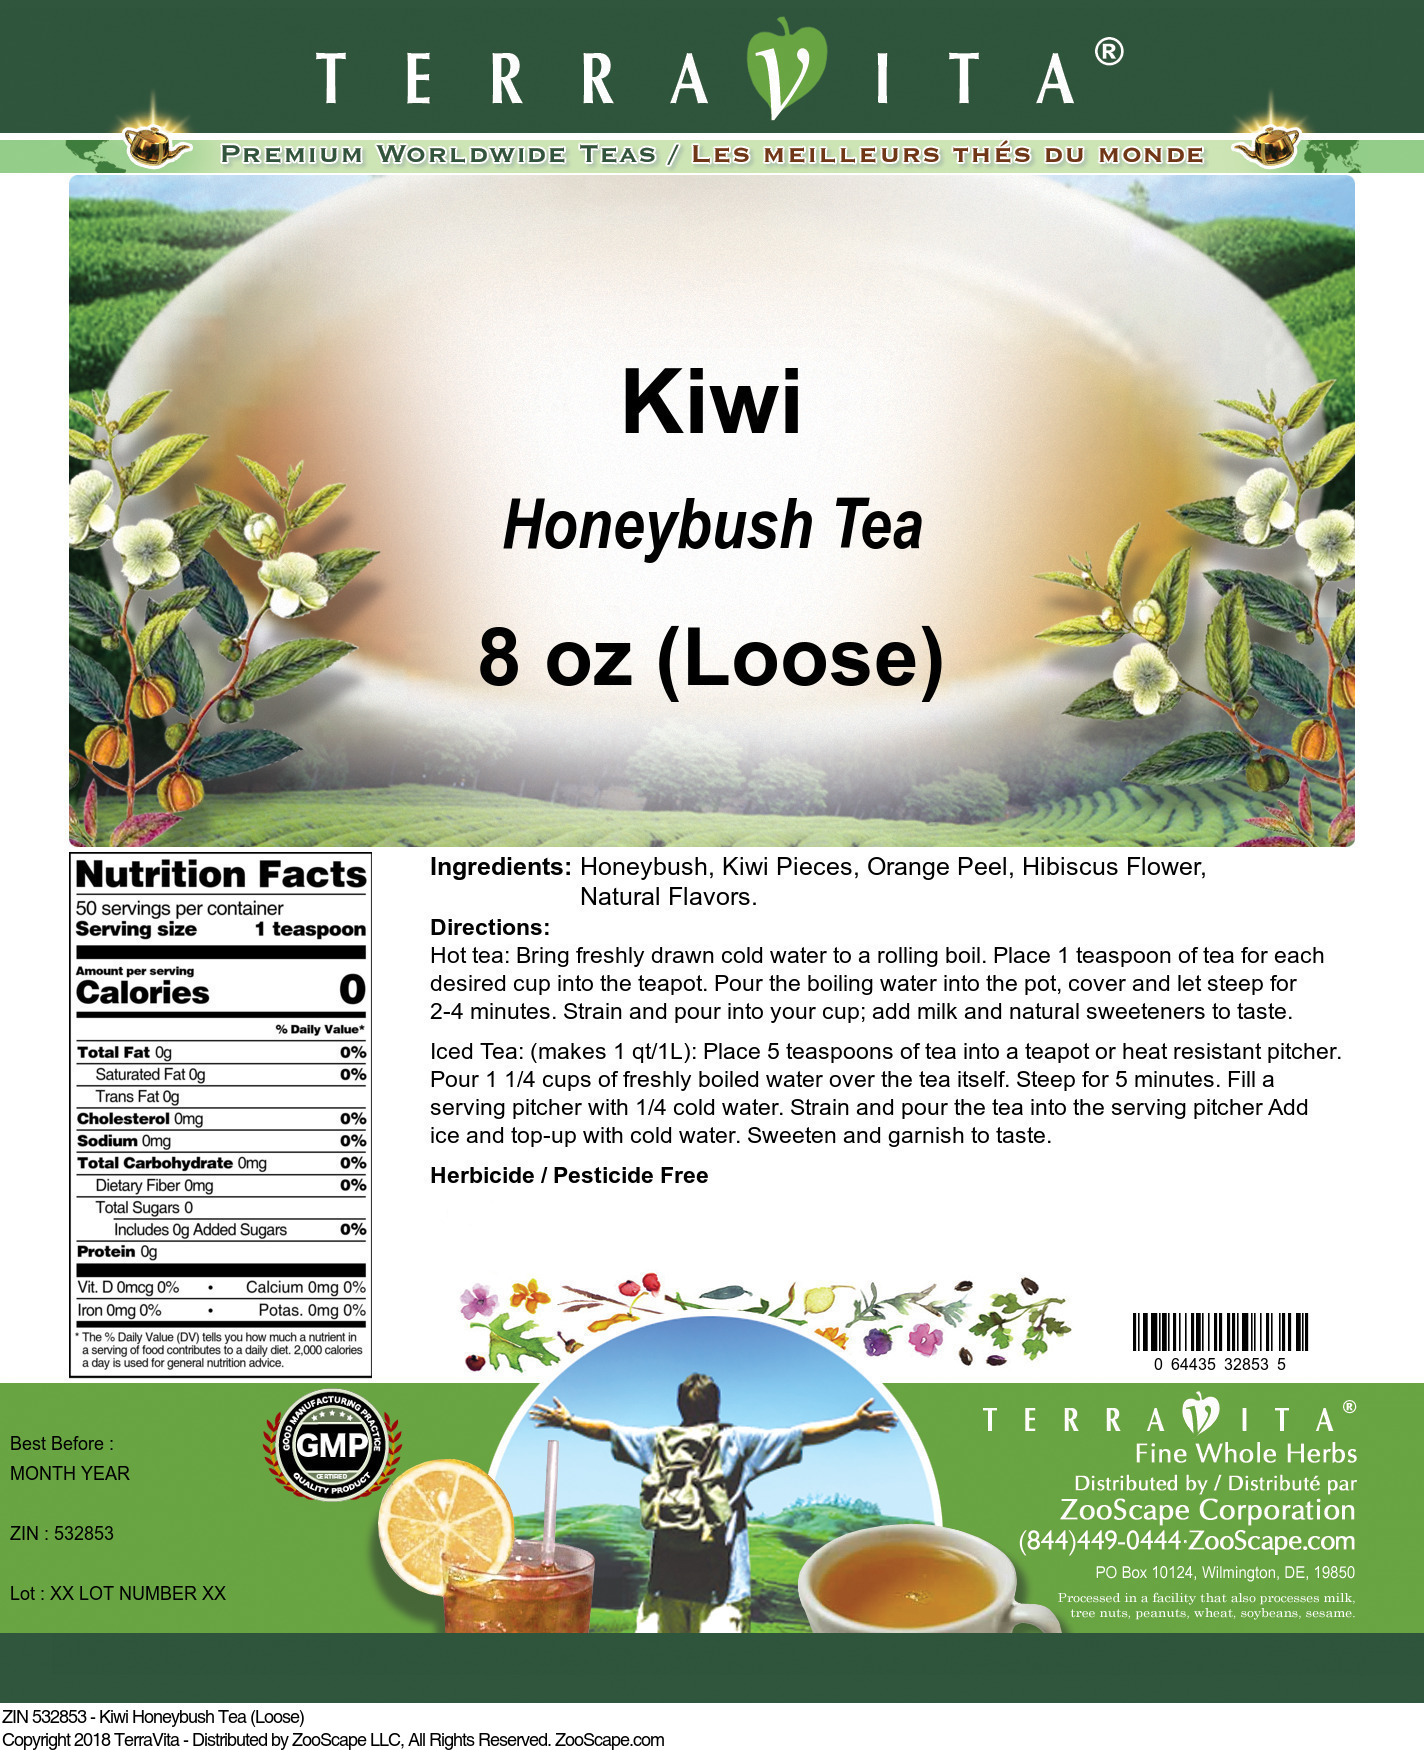 Kiwi Honeybush Tea